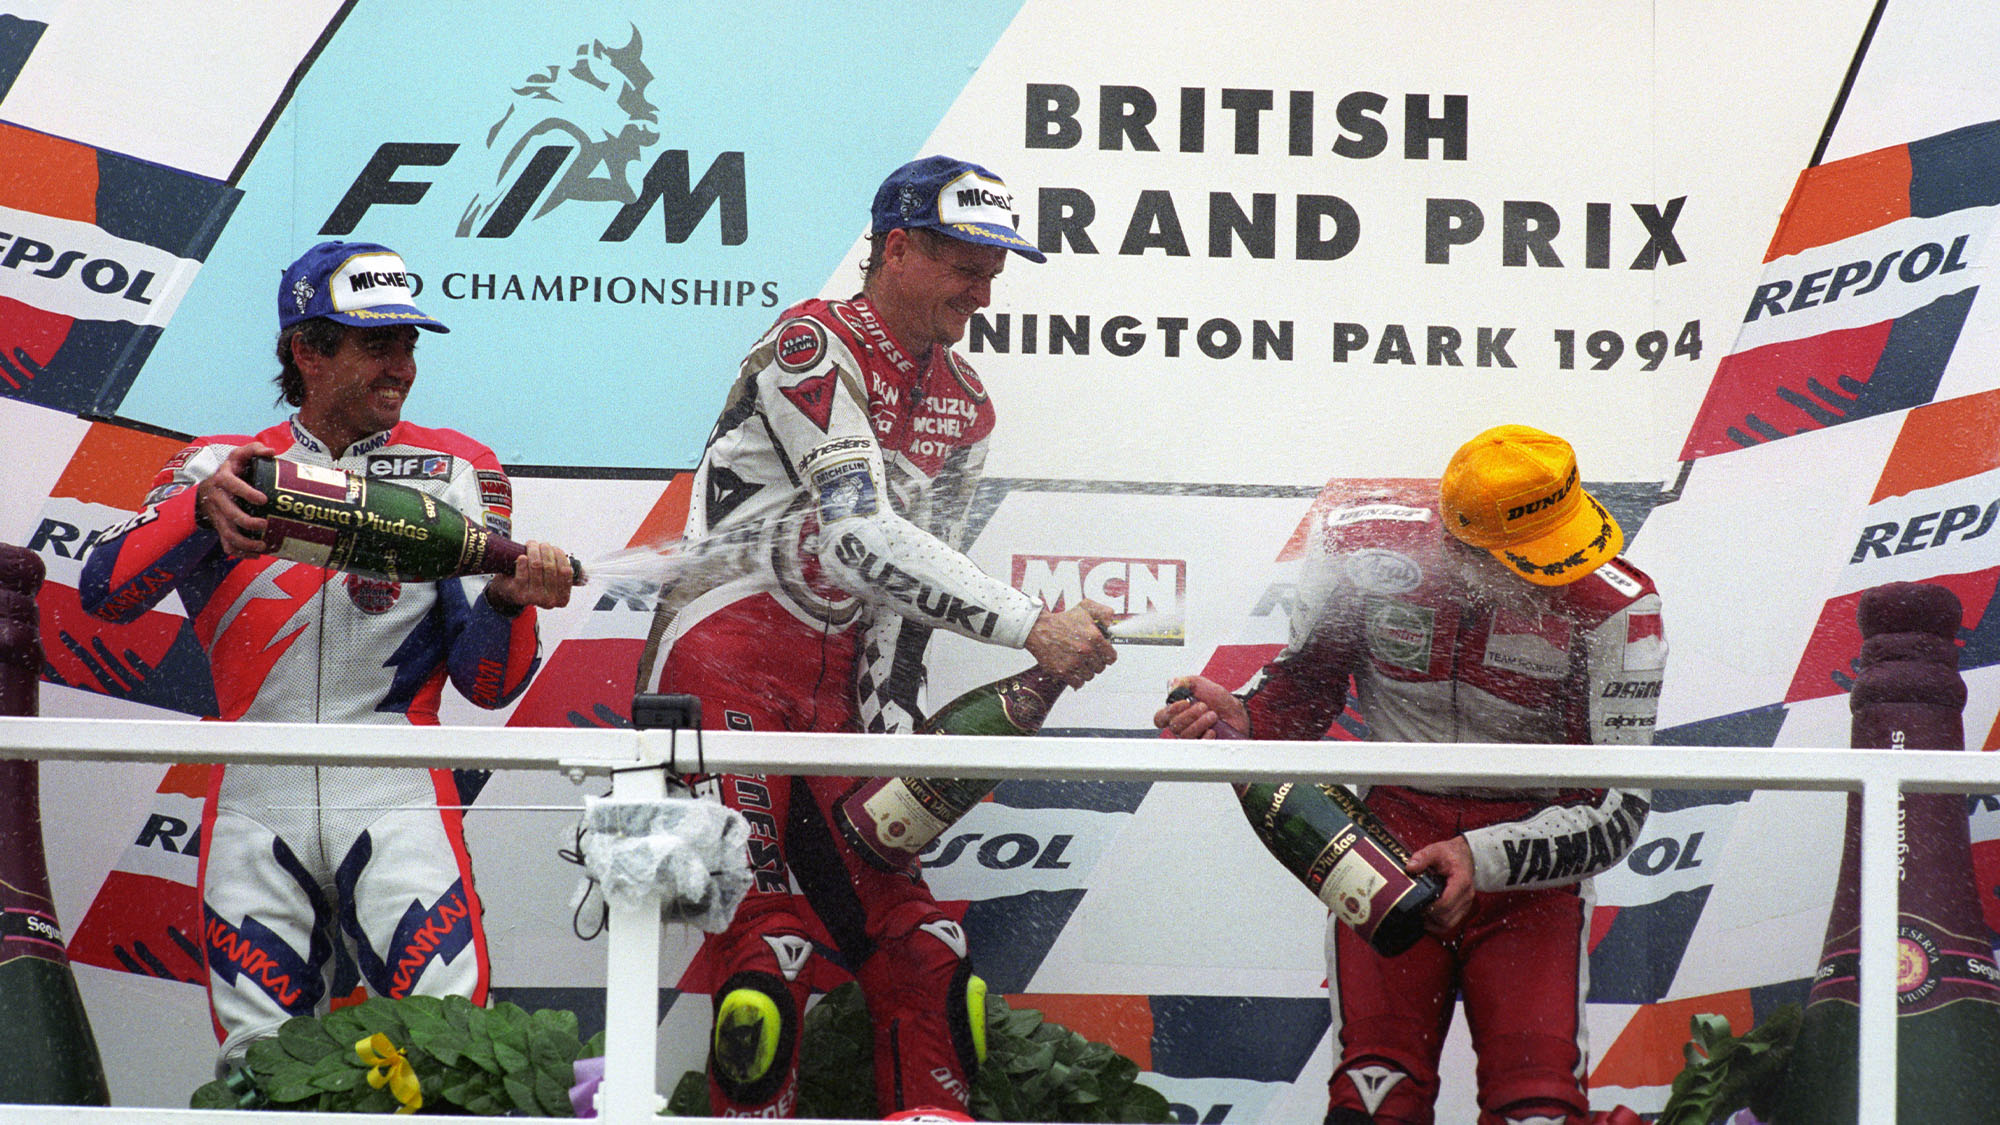 1994 500cc British Grand Prix podium with Kevin Schwantz